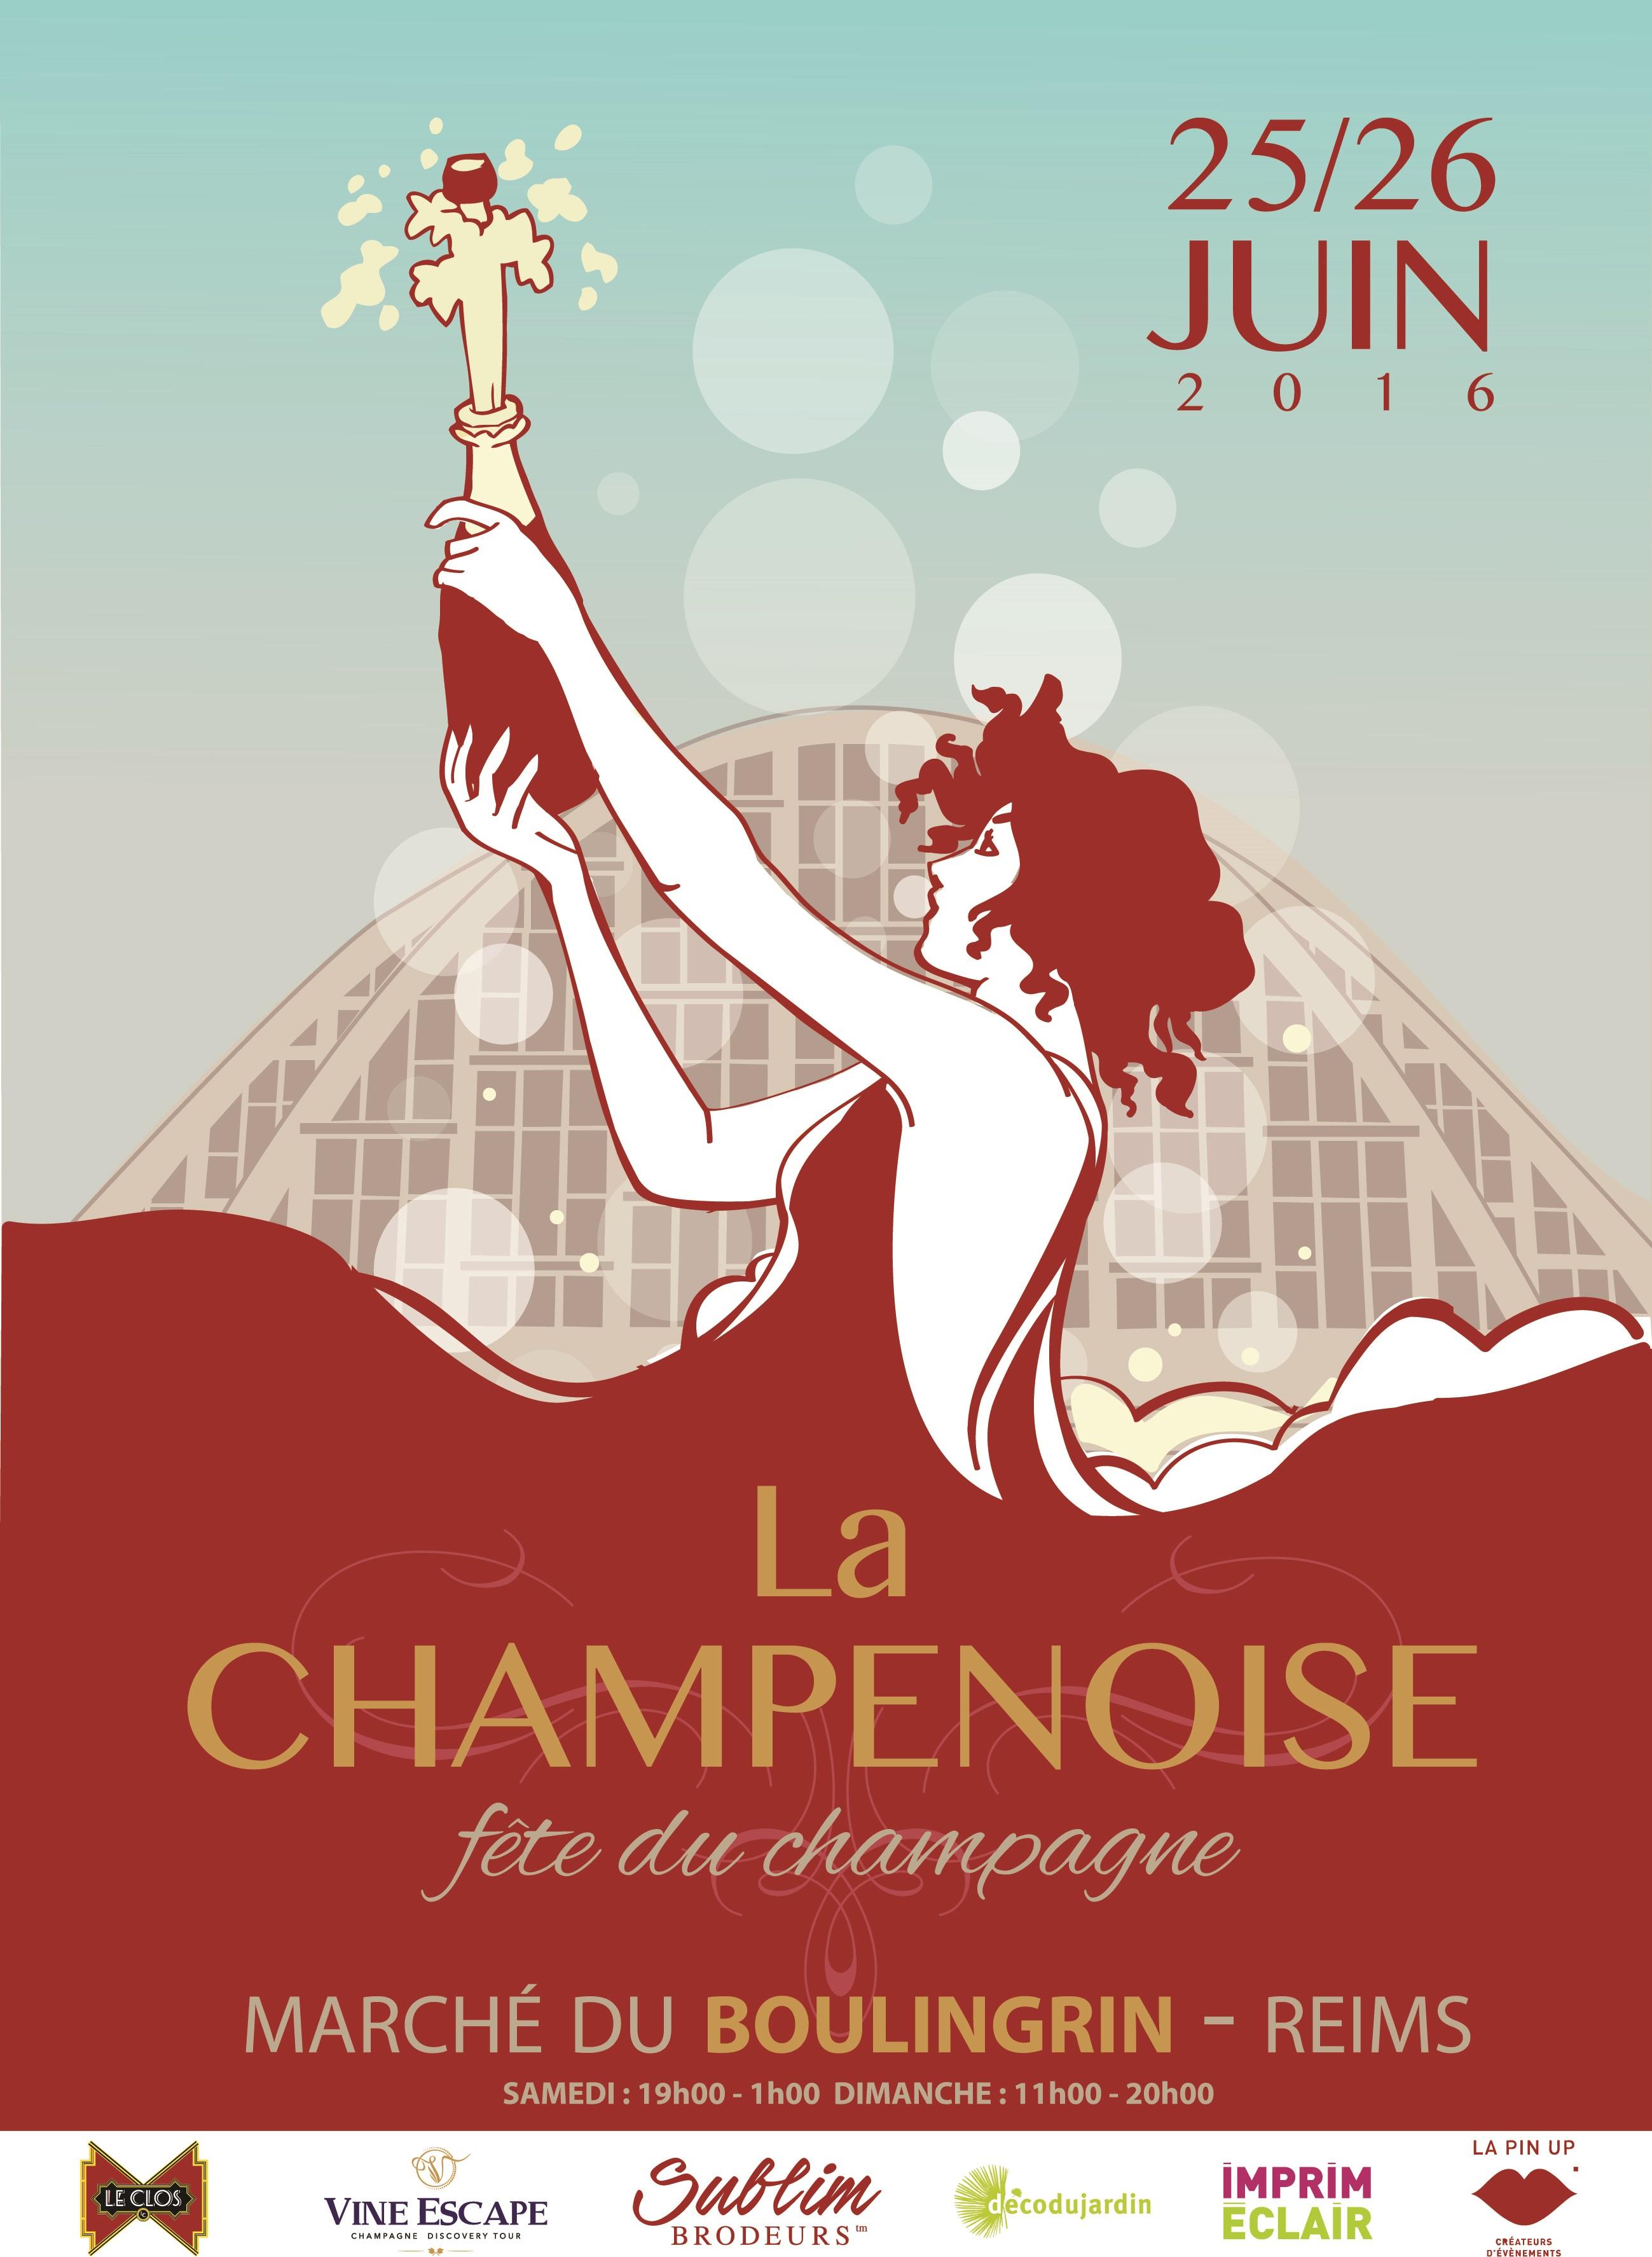 La Champenoise Poster